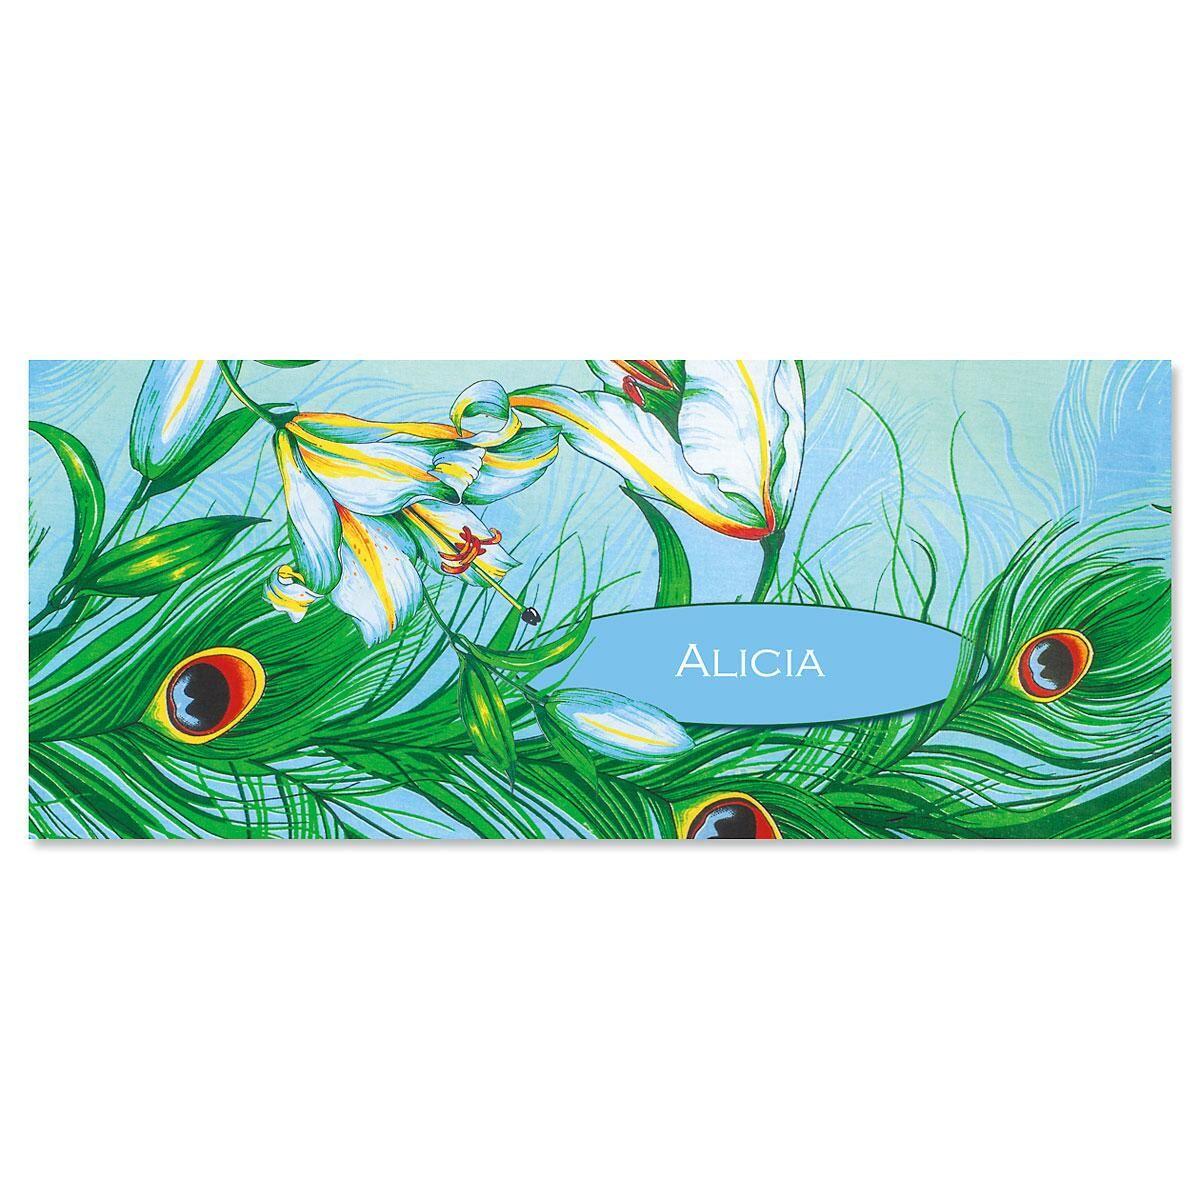 Purity Slimline Custom Note Cards